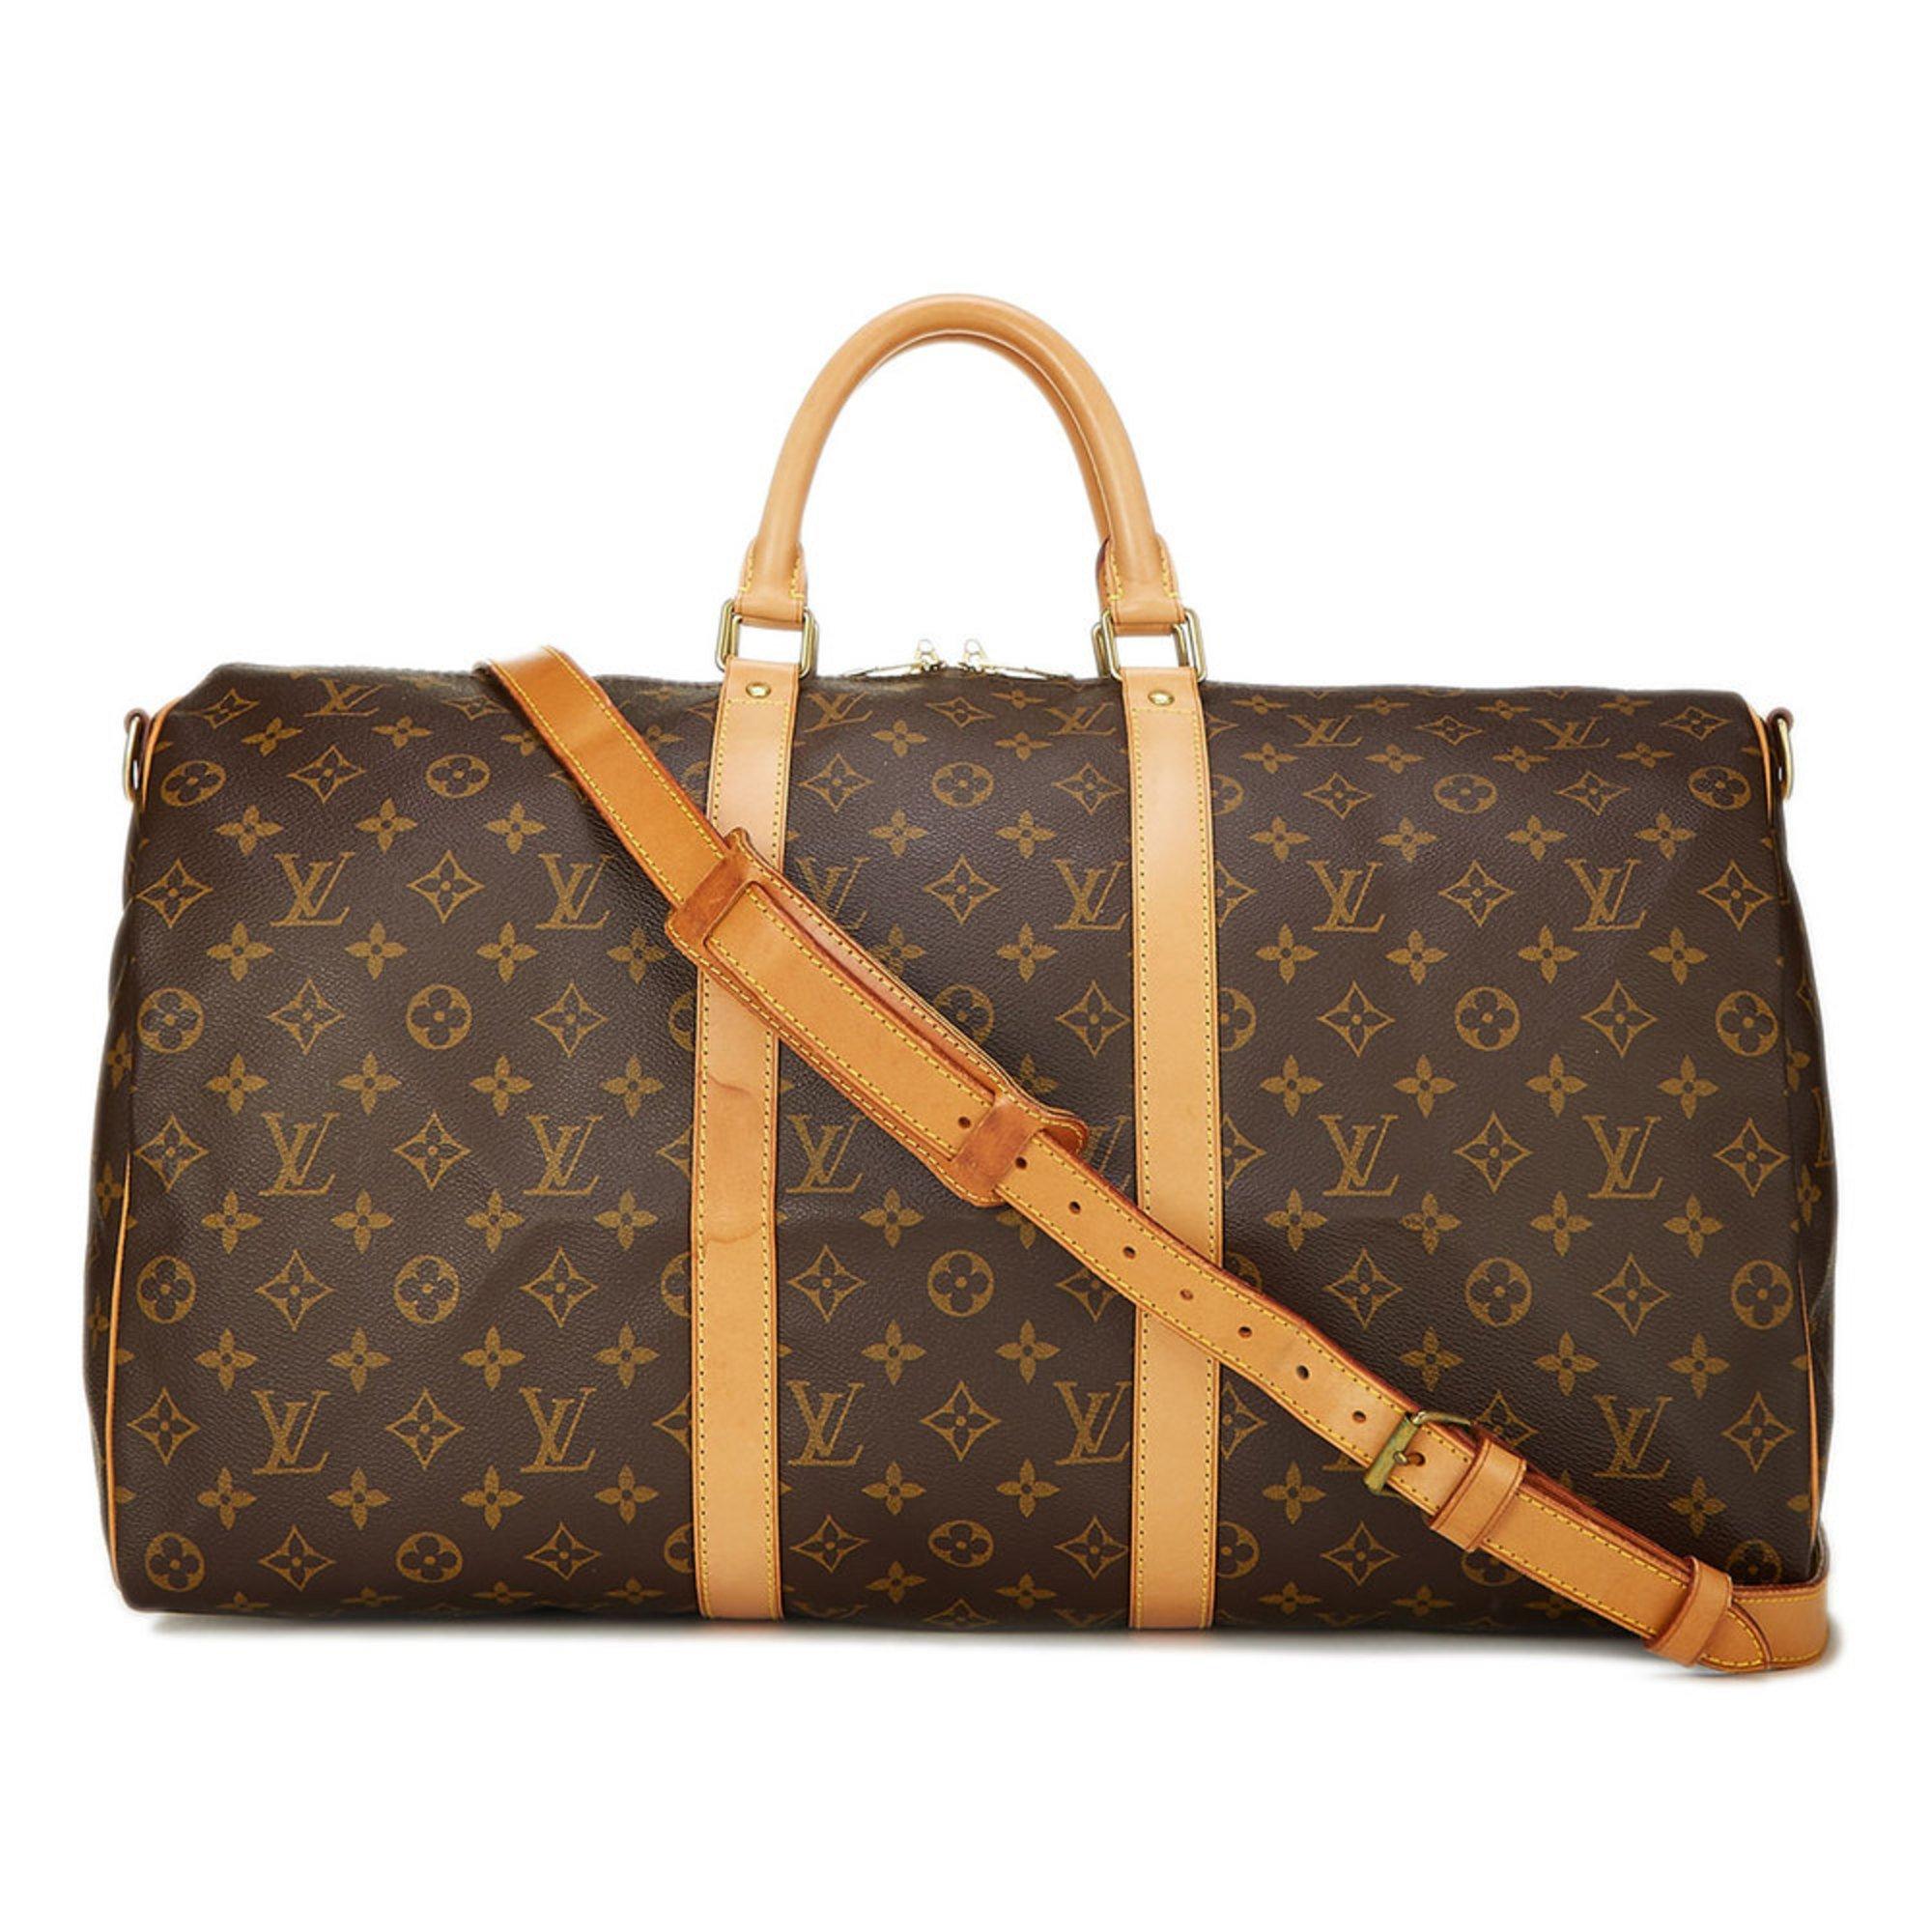 c55cabd8c0861 Louis Vuitton Monogram Keepall Bando 50